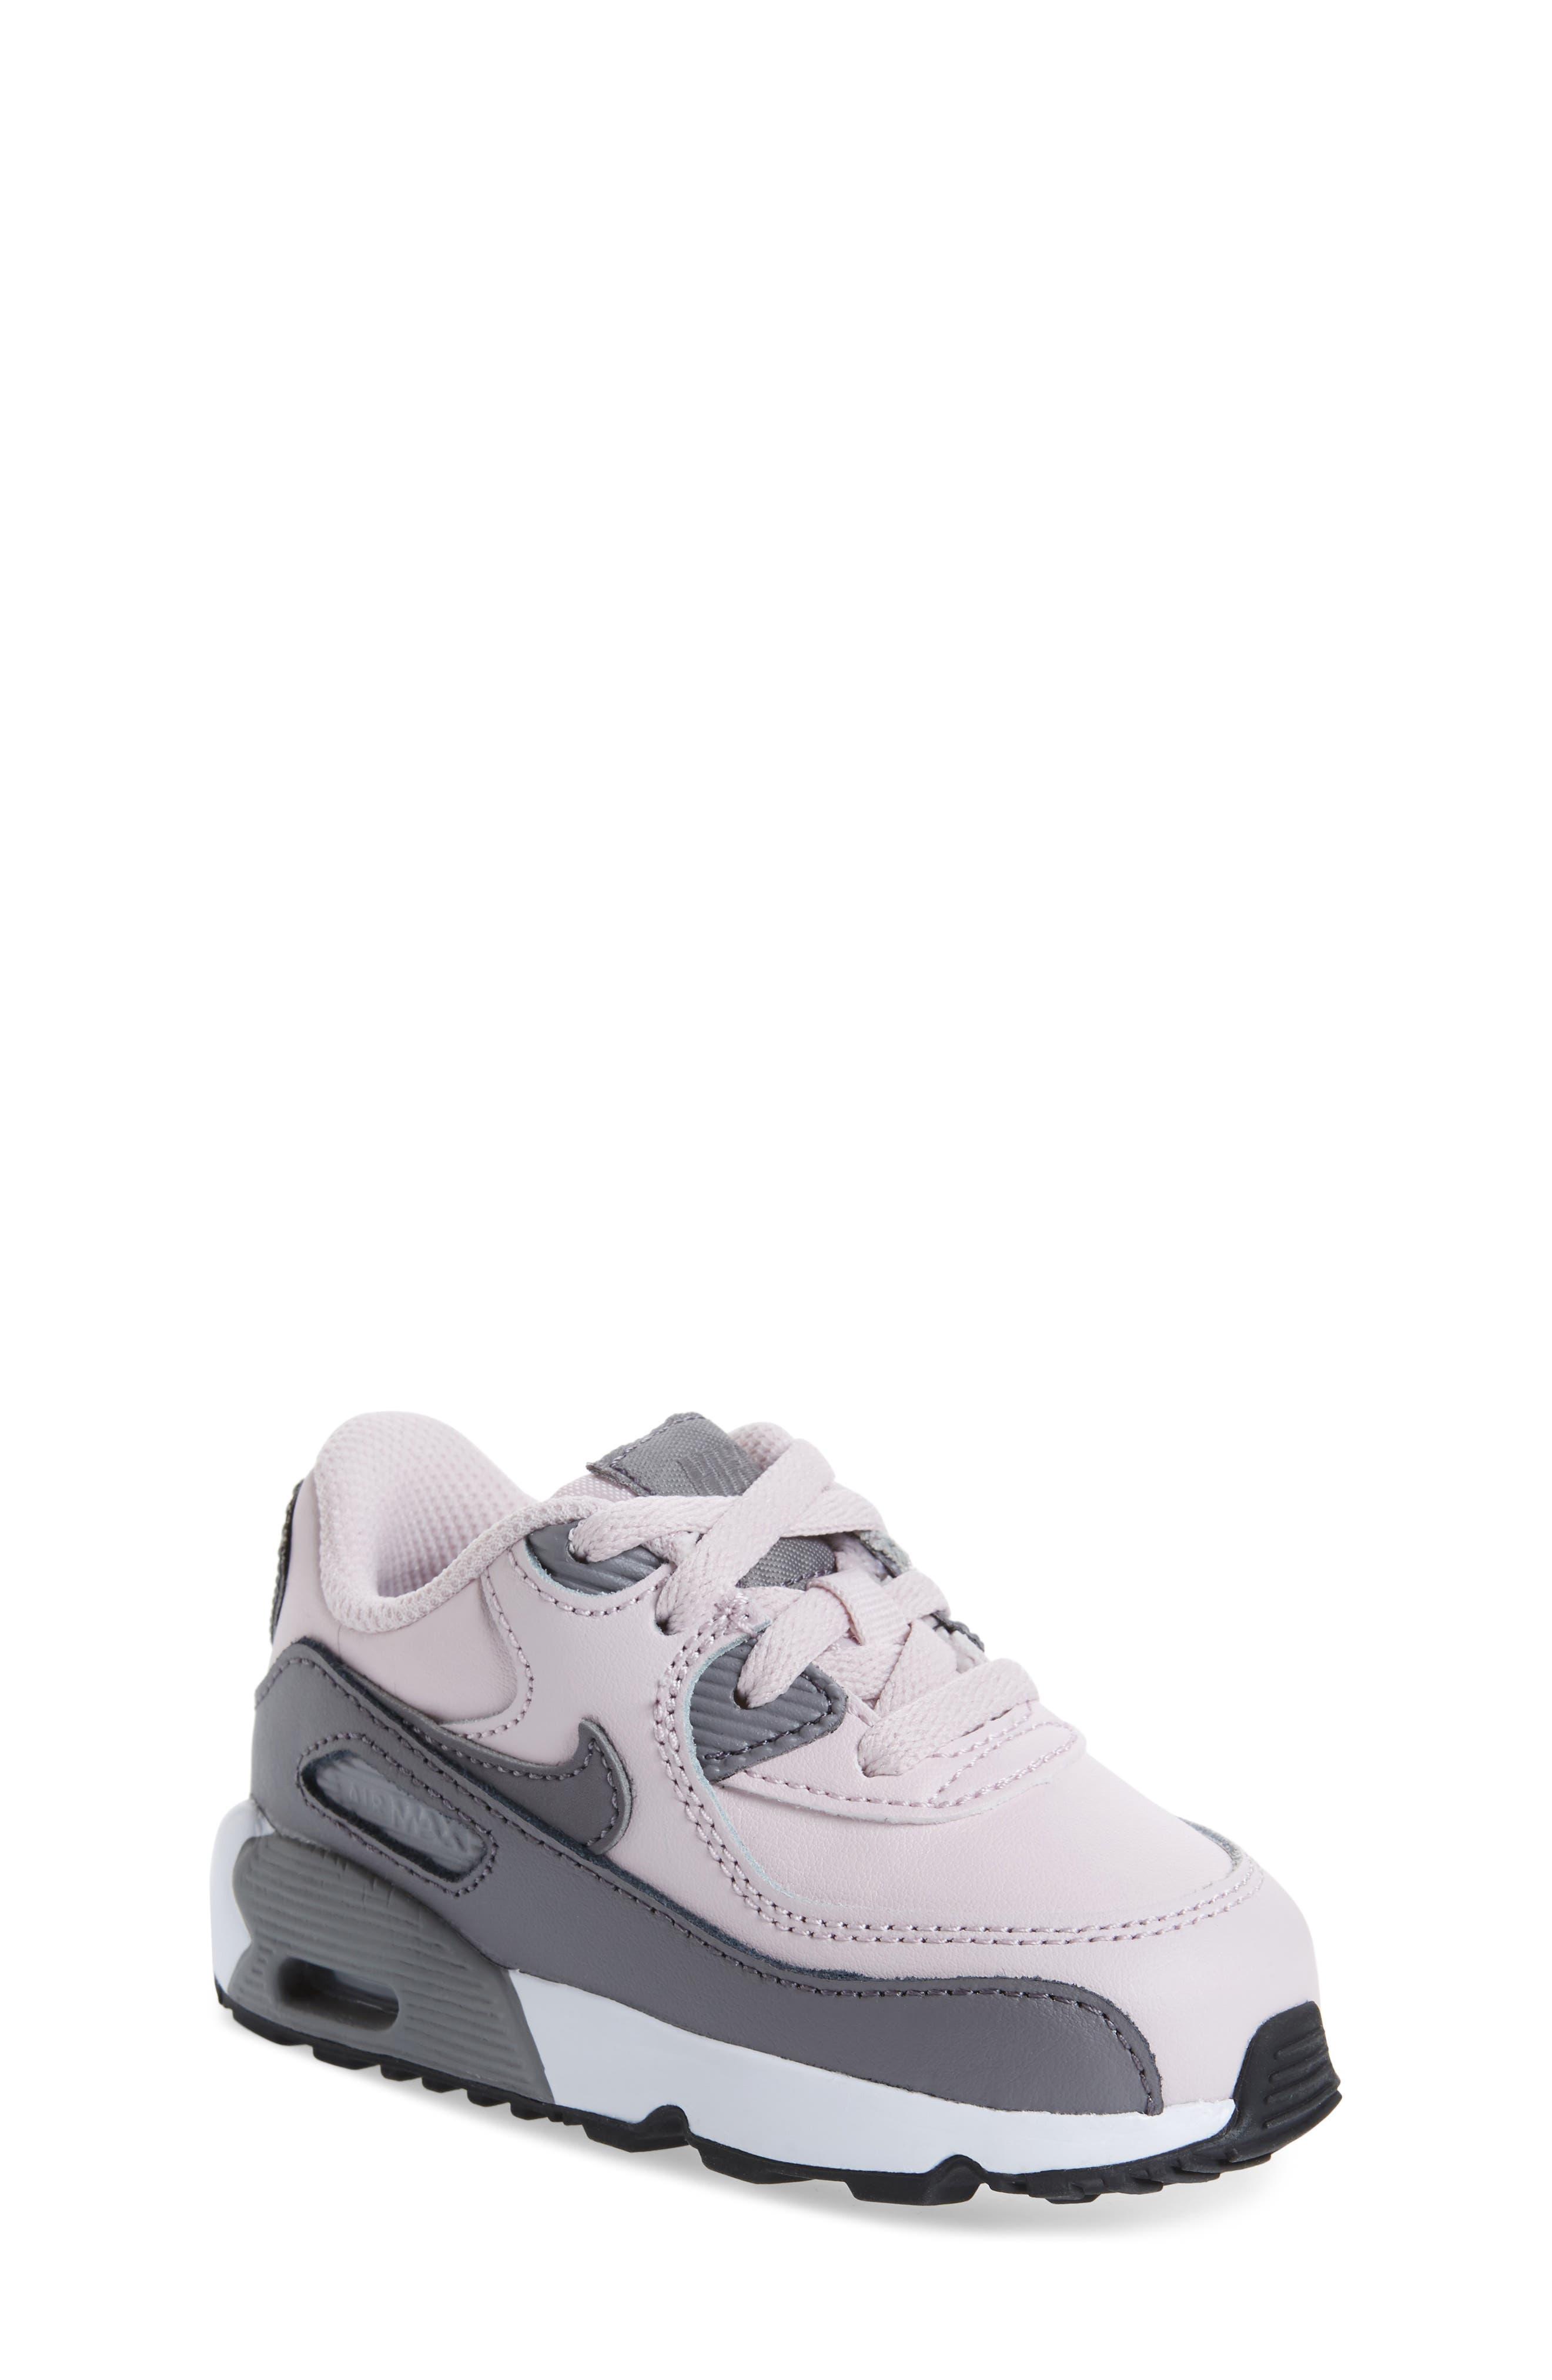 Main Image - Nike 'Air Max 90' Sneaker (Baby, Walker, Toddler, Little Kid & Big Kid)